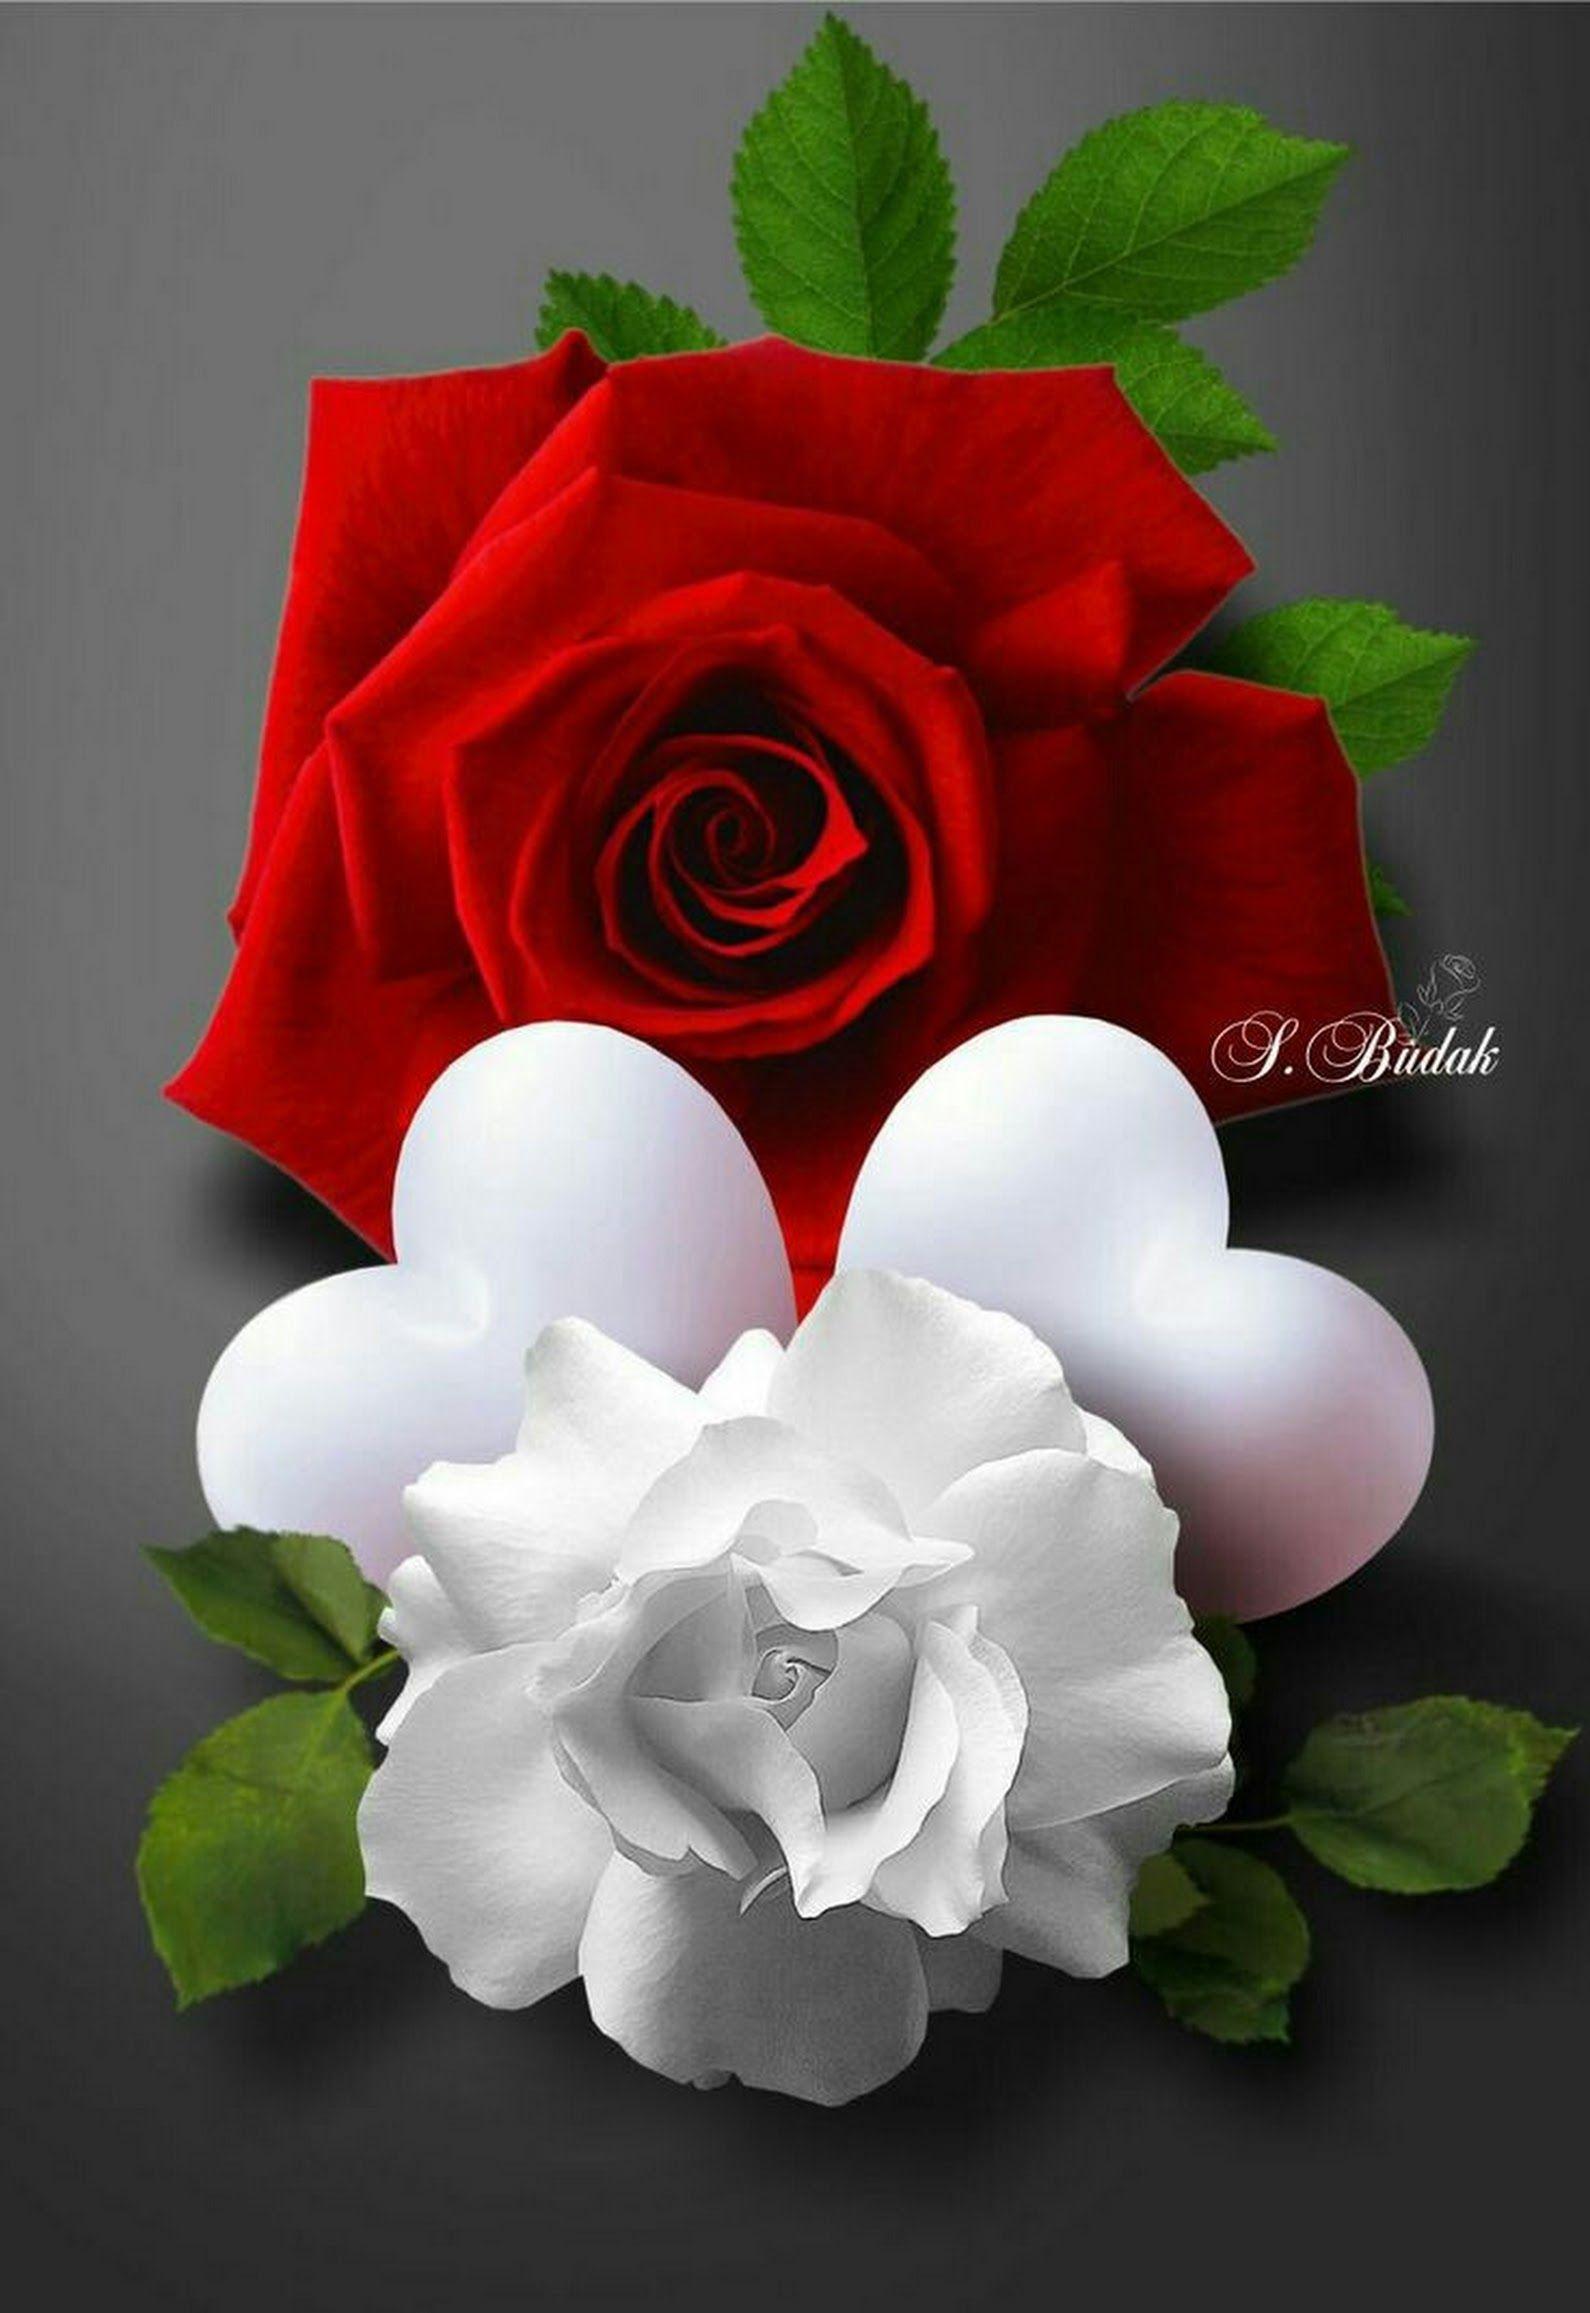 Hossein Con Imagenes Rosas Bonitas Rosas Flores Bonitas